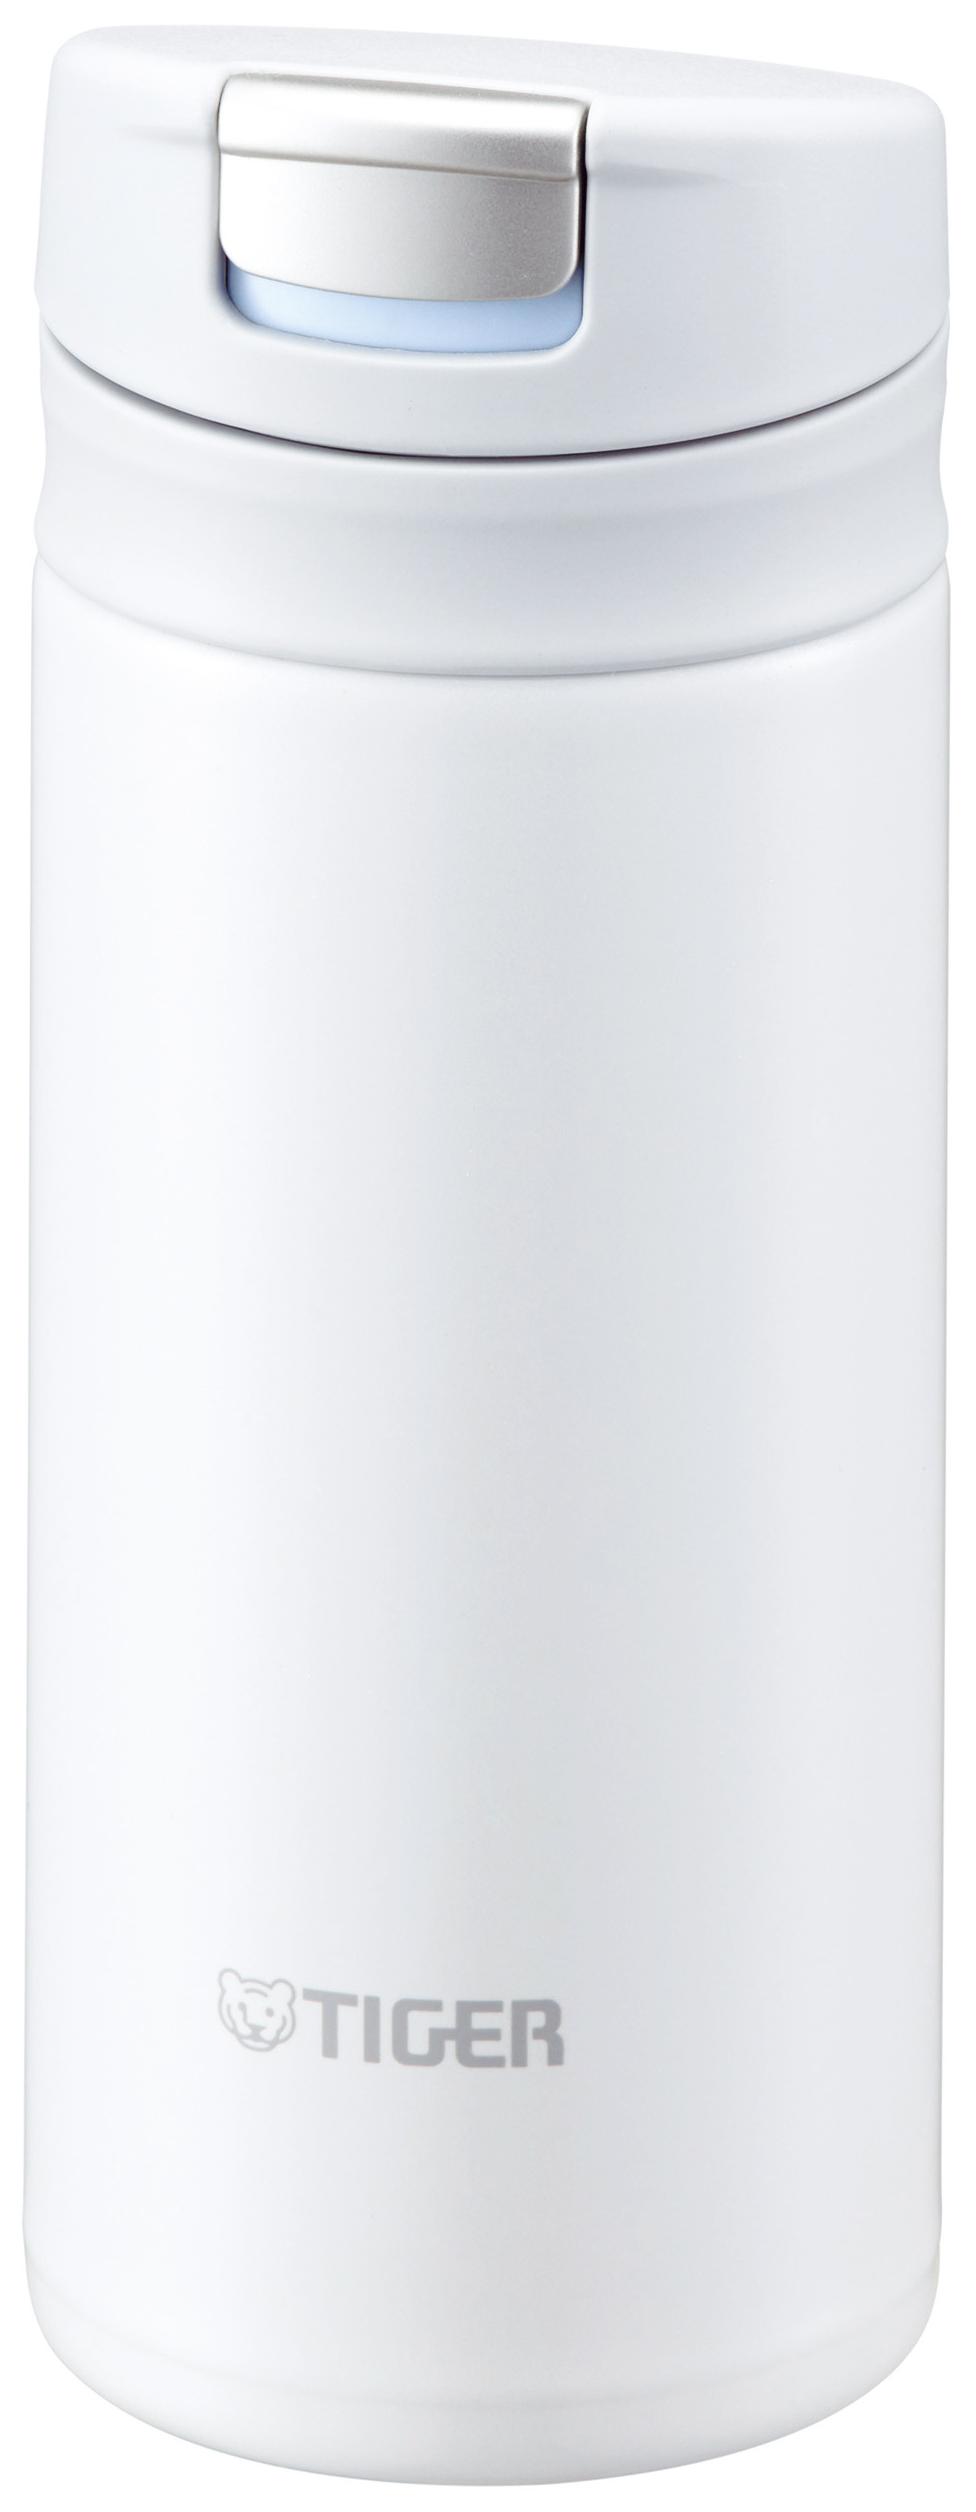 Термокружка Tiger MMX-A020 Snow White 0,2 л (цвет снежно-белый) термокружка la playa football can 500ml white 560104